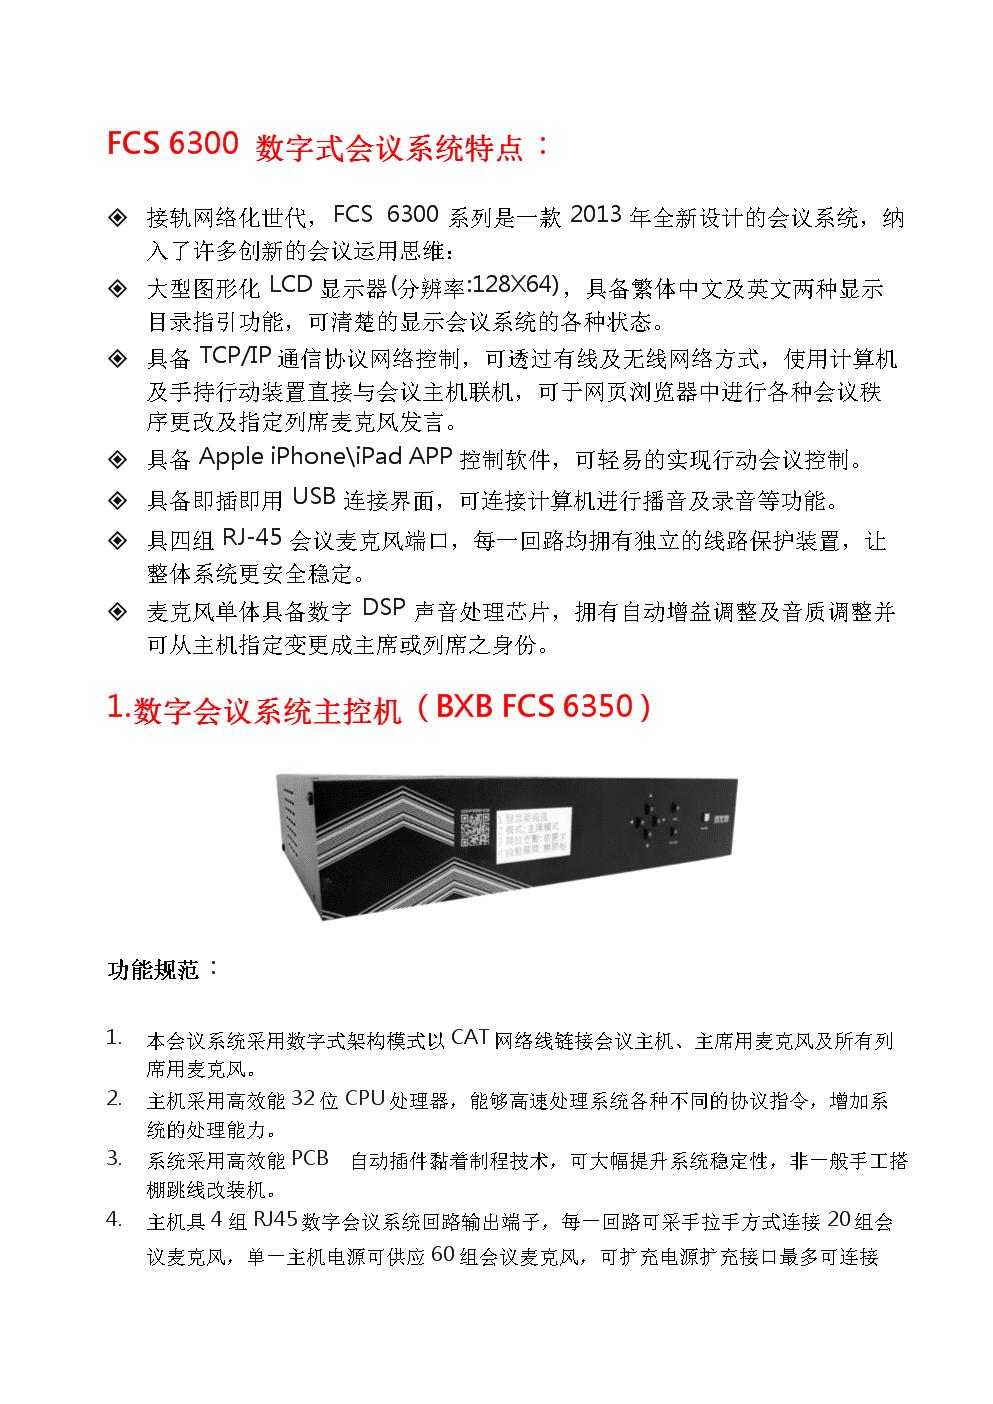 BXB FCS 6350数字会议系统说明书.doc